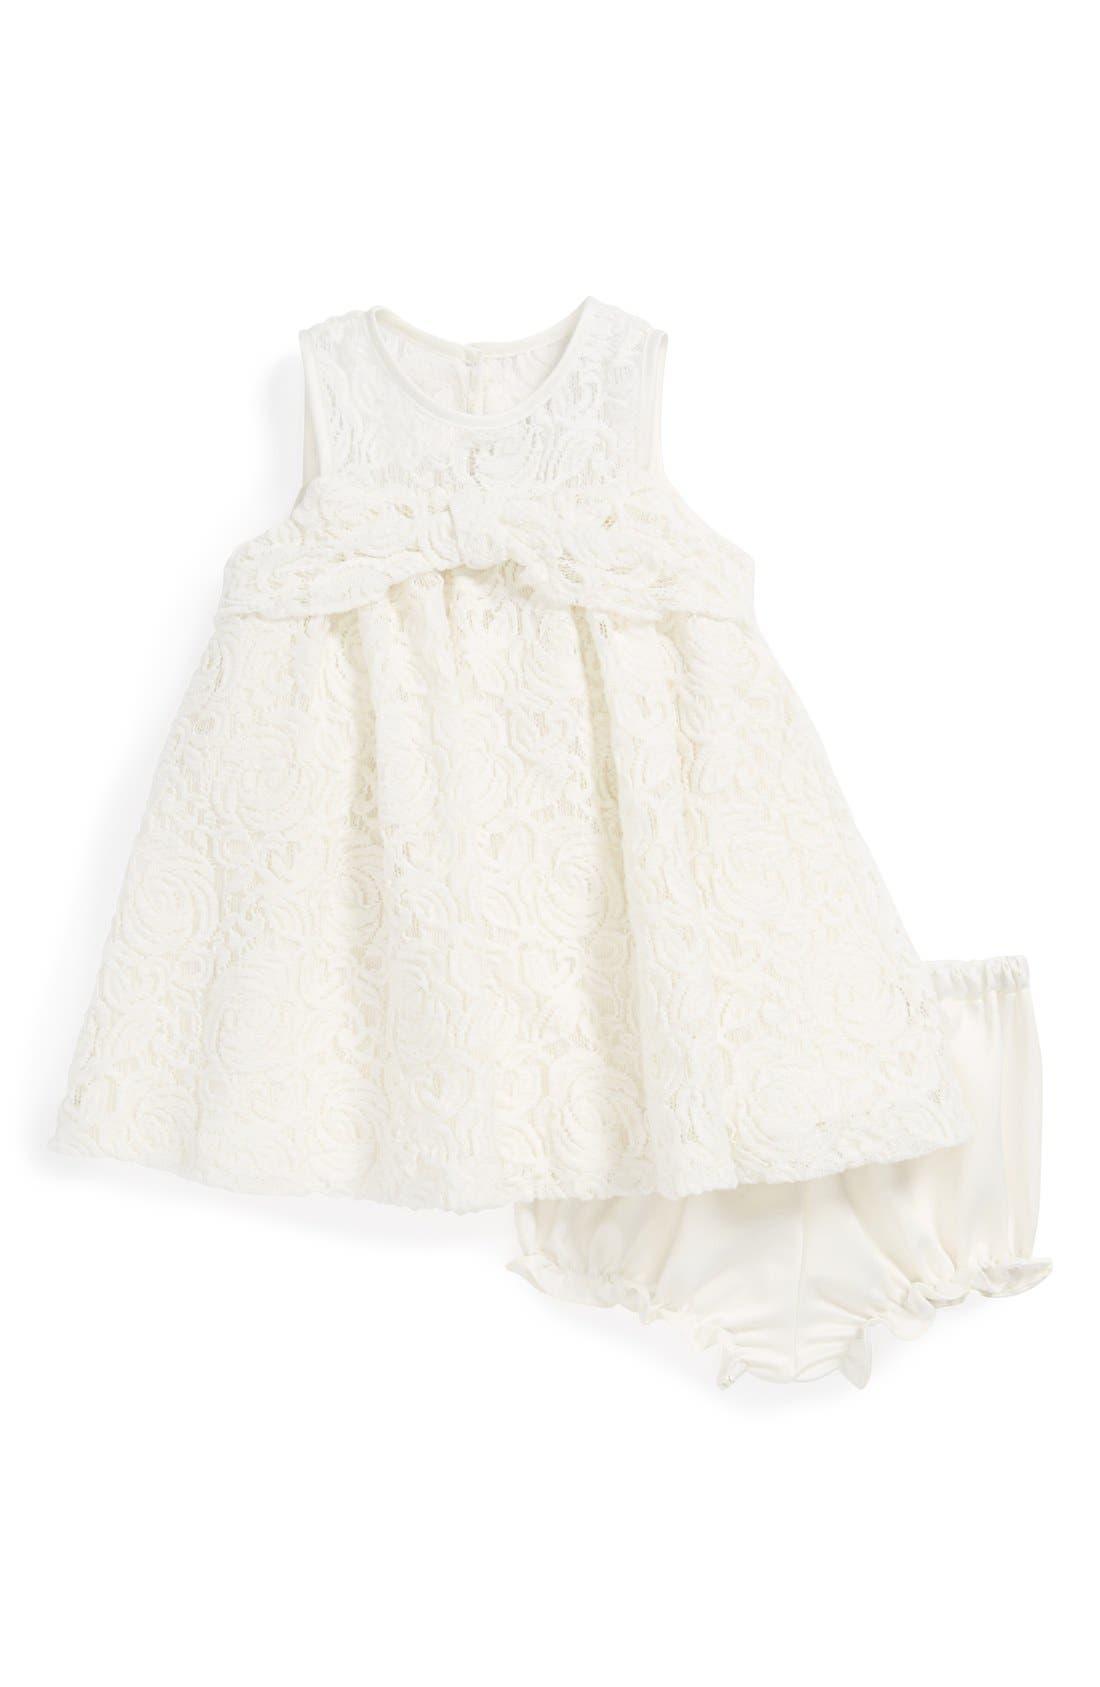 Main Image - Pippa & Julie White Lace Dress & Bloomers (Baby Girls)